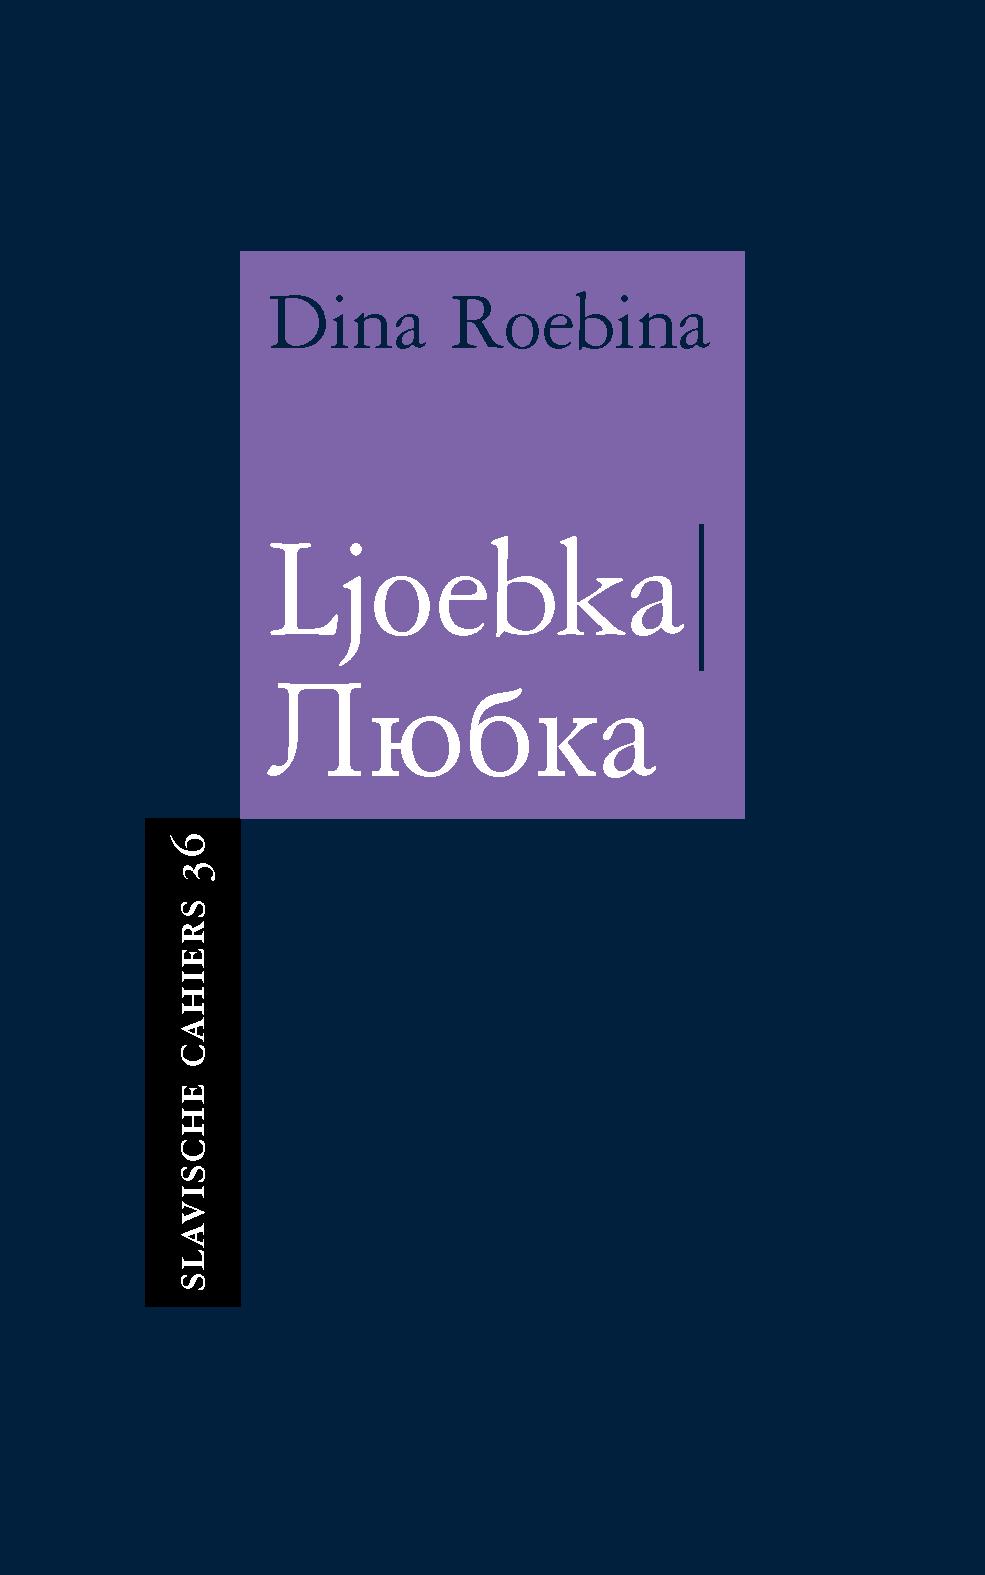 Presentatie 'Ljoebka' van Dina Roebina